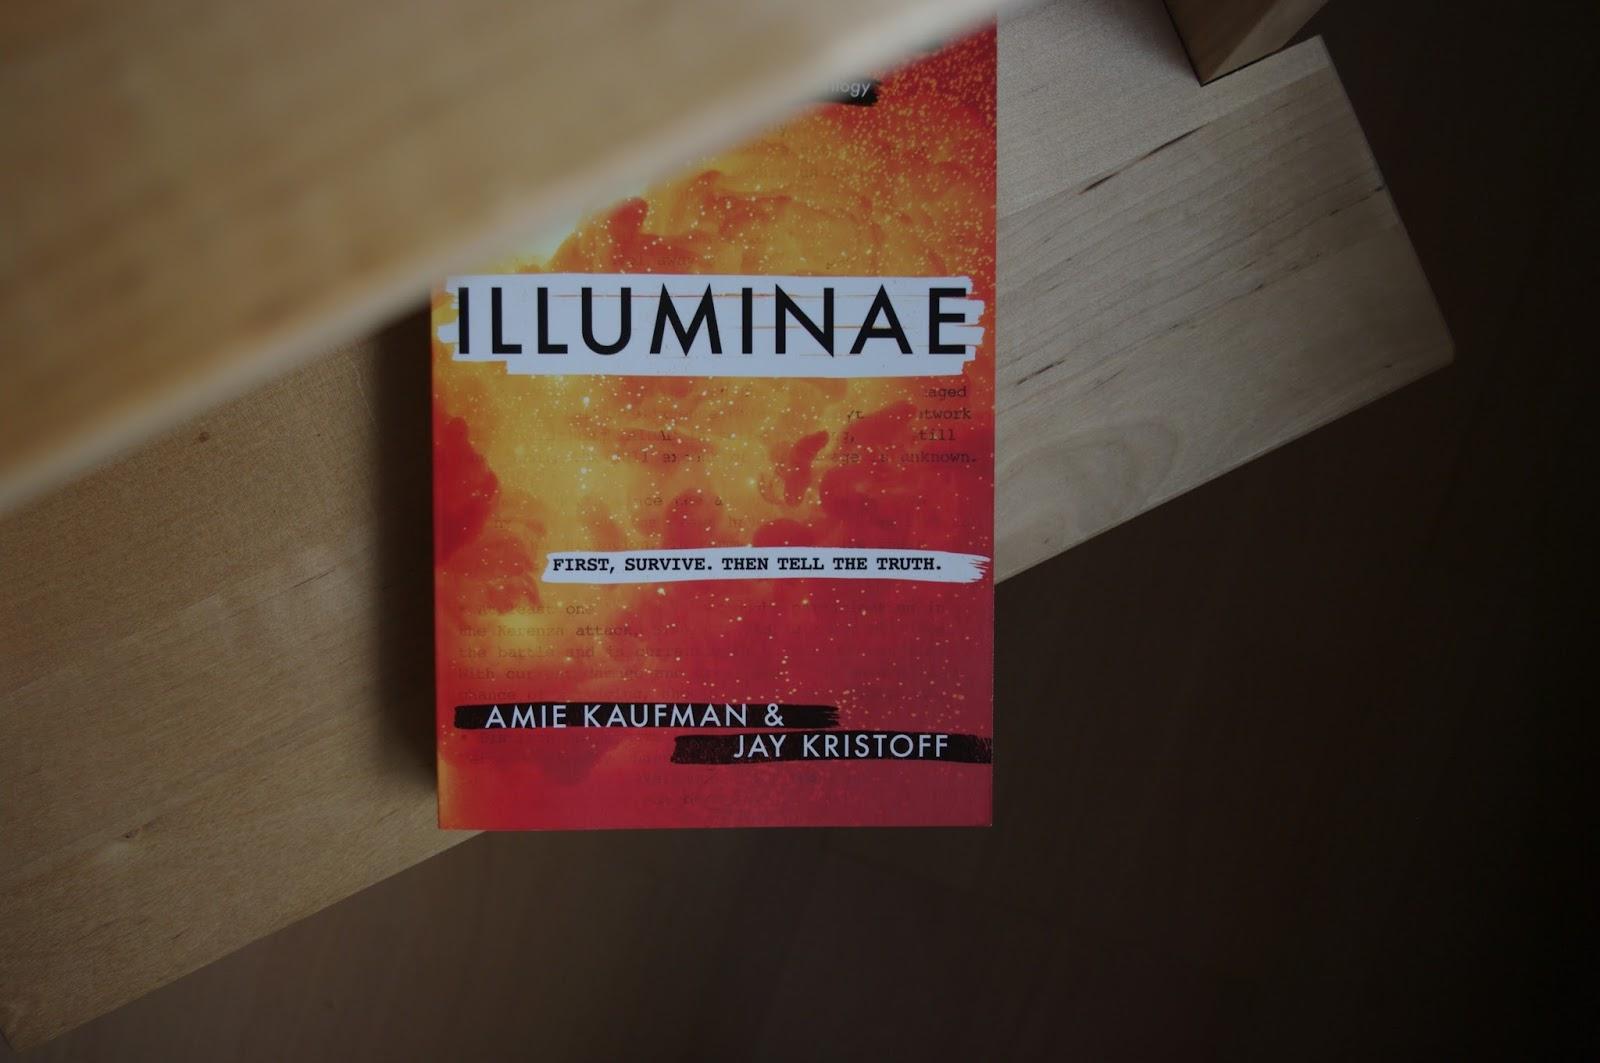 [Rezension] Illuminae - Jay Kristoff und Amie Kaufman